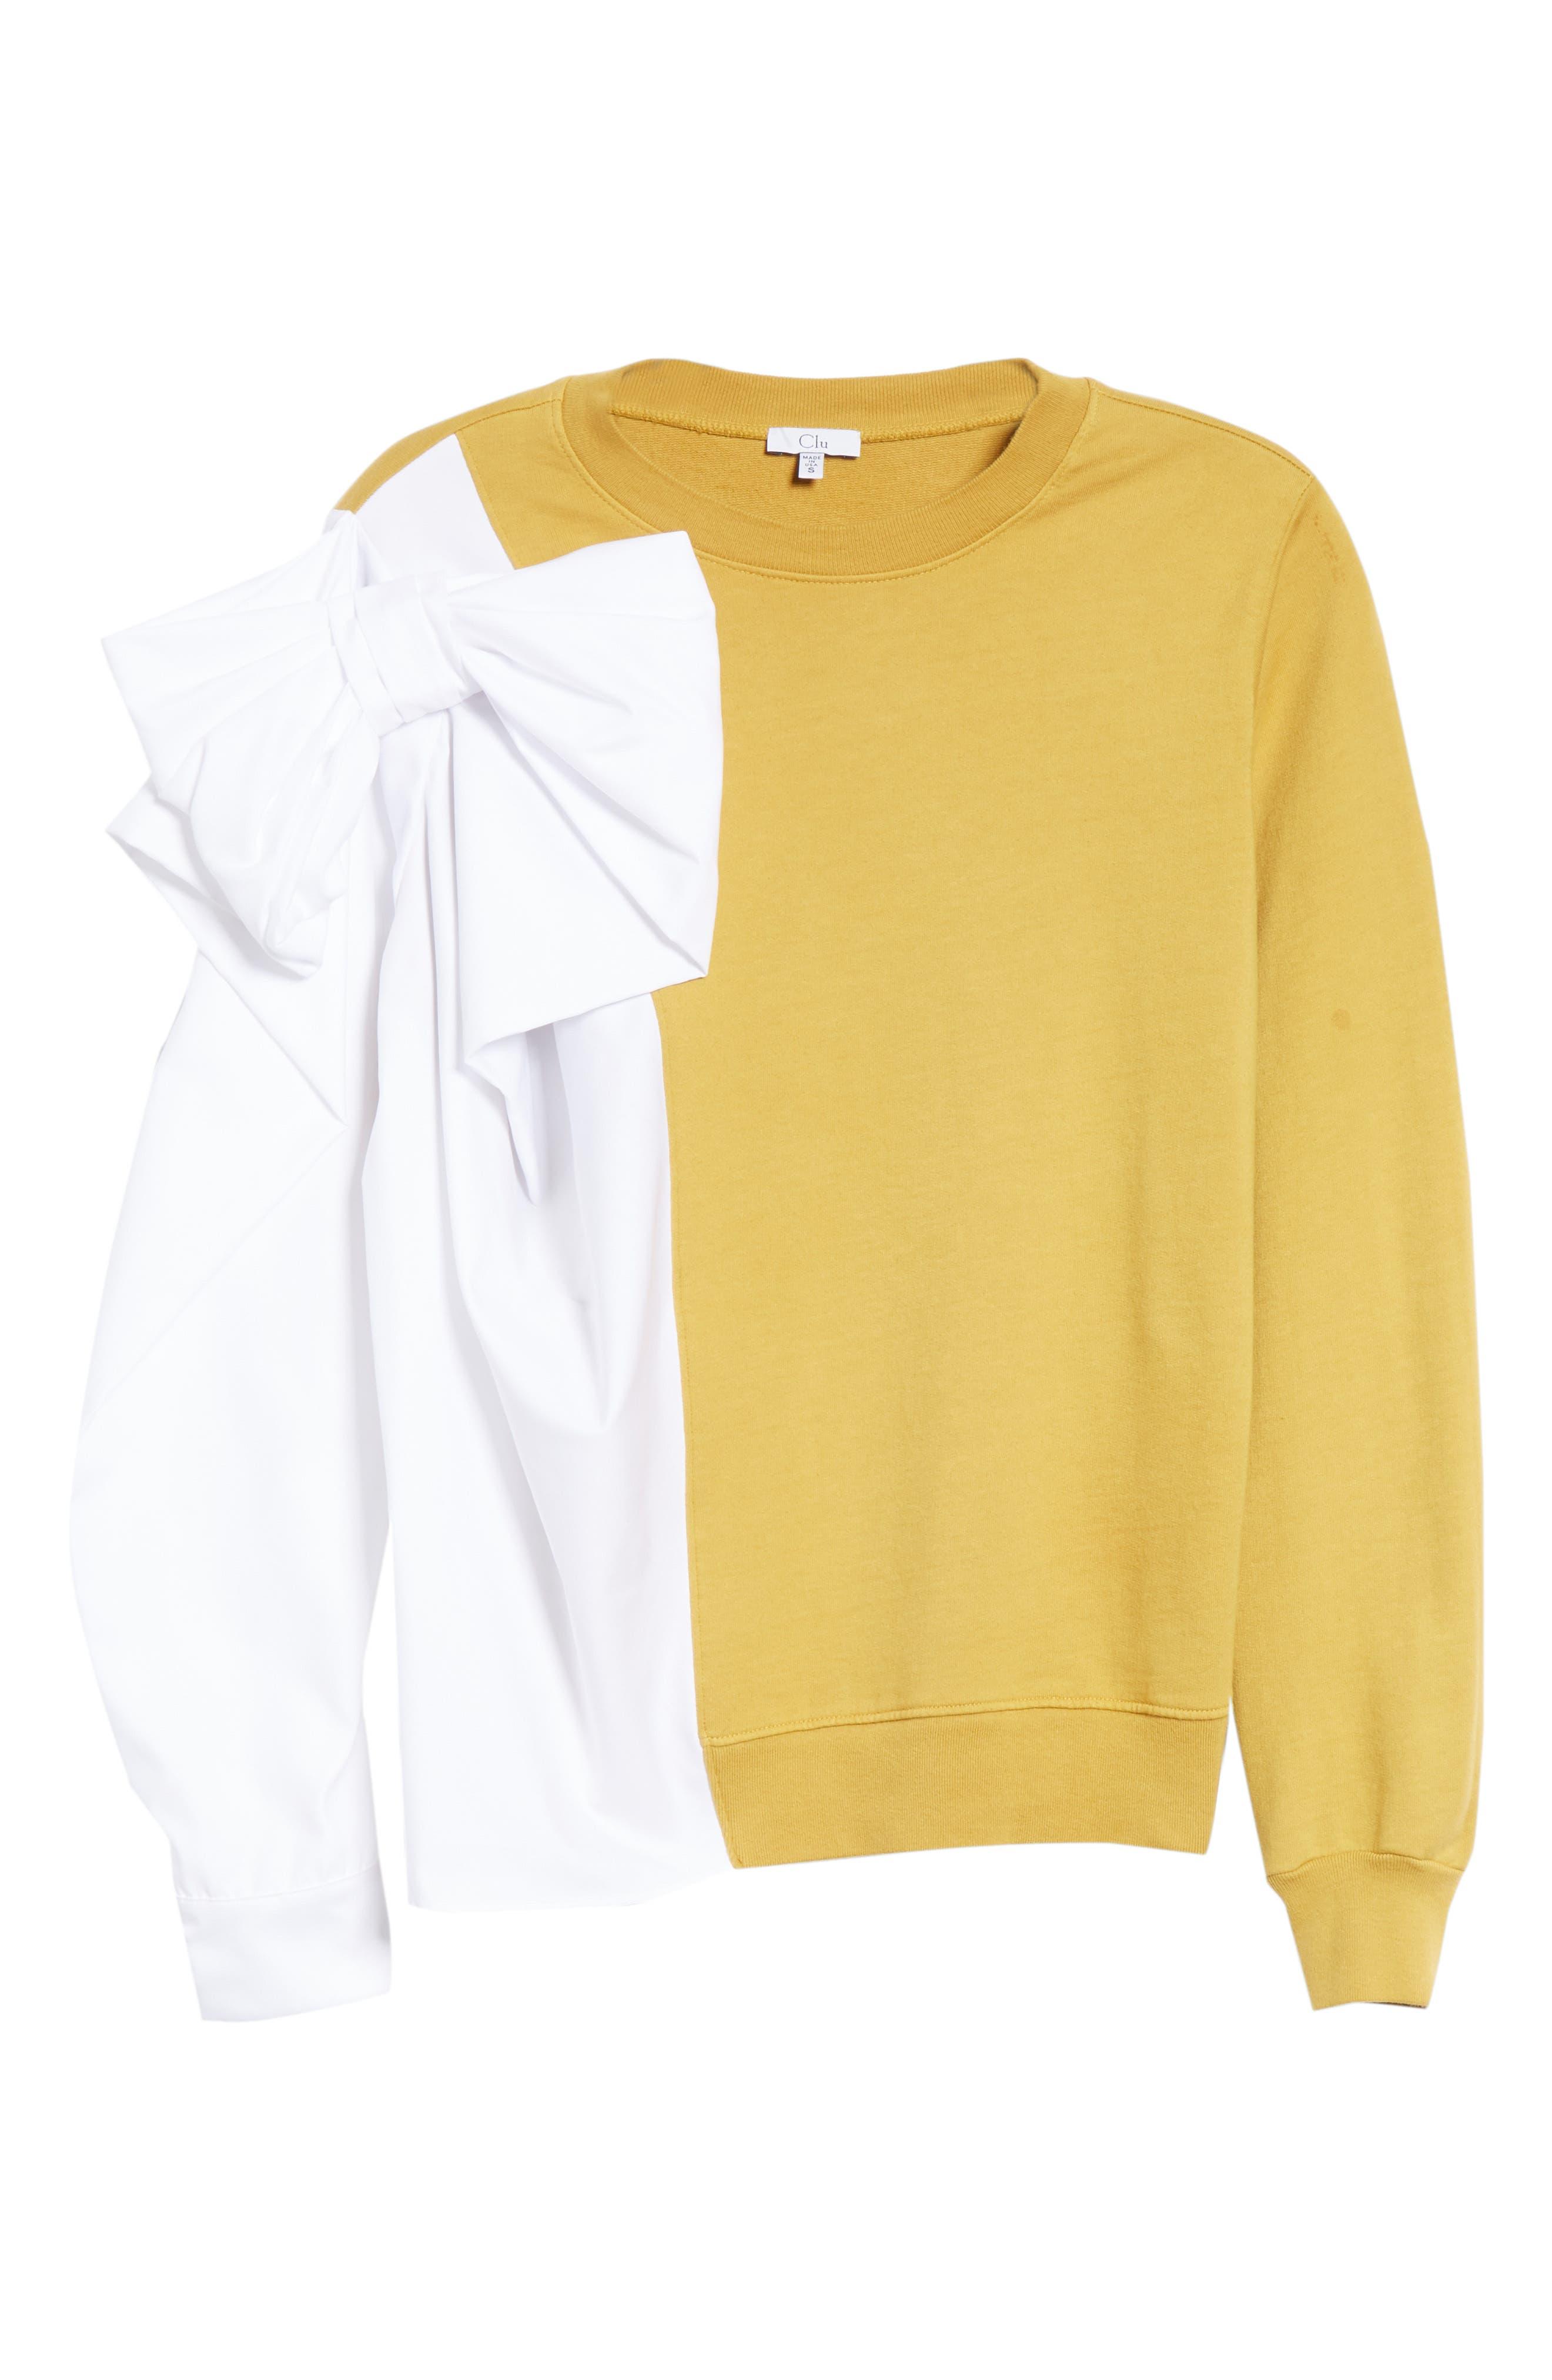 Bow Colorblock Sweatshirt,                             Alternate thumbnail 6, color,                             MUSTARD/ WHITE